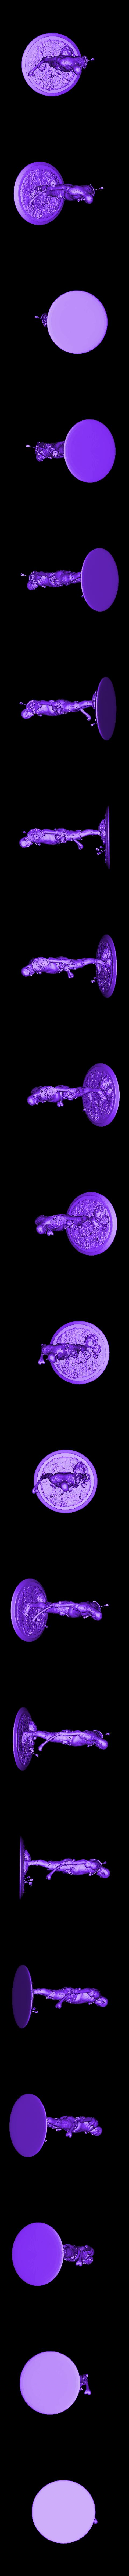 monster_repaired.stl Download free STL file Cannibal tabletop figure • 3D printing object, Boris3dStudio